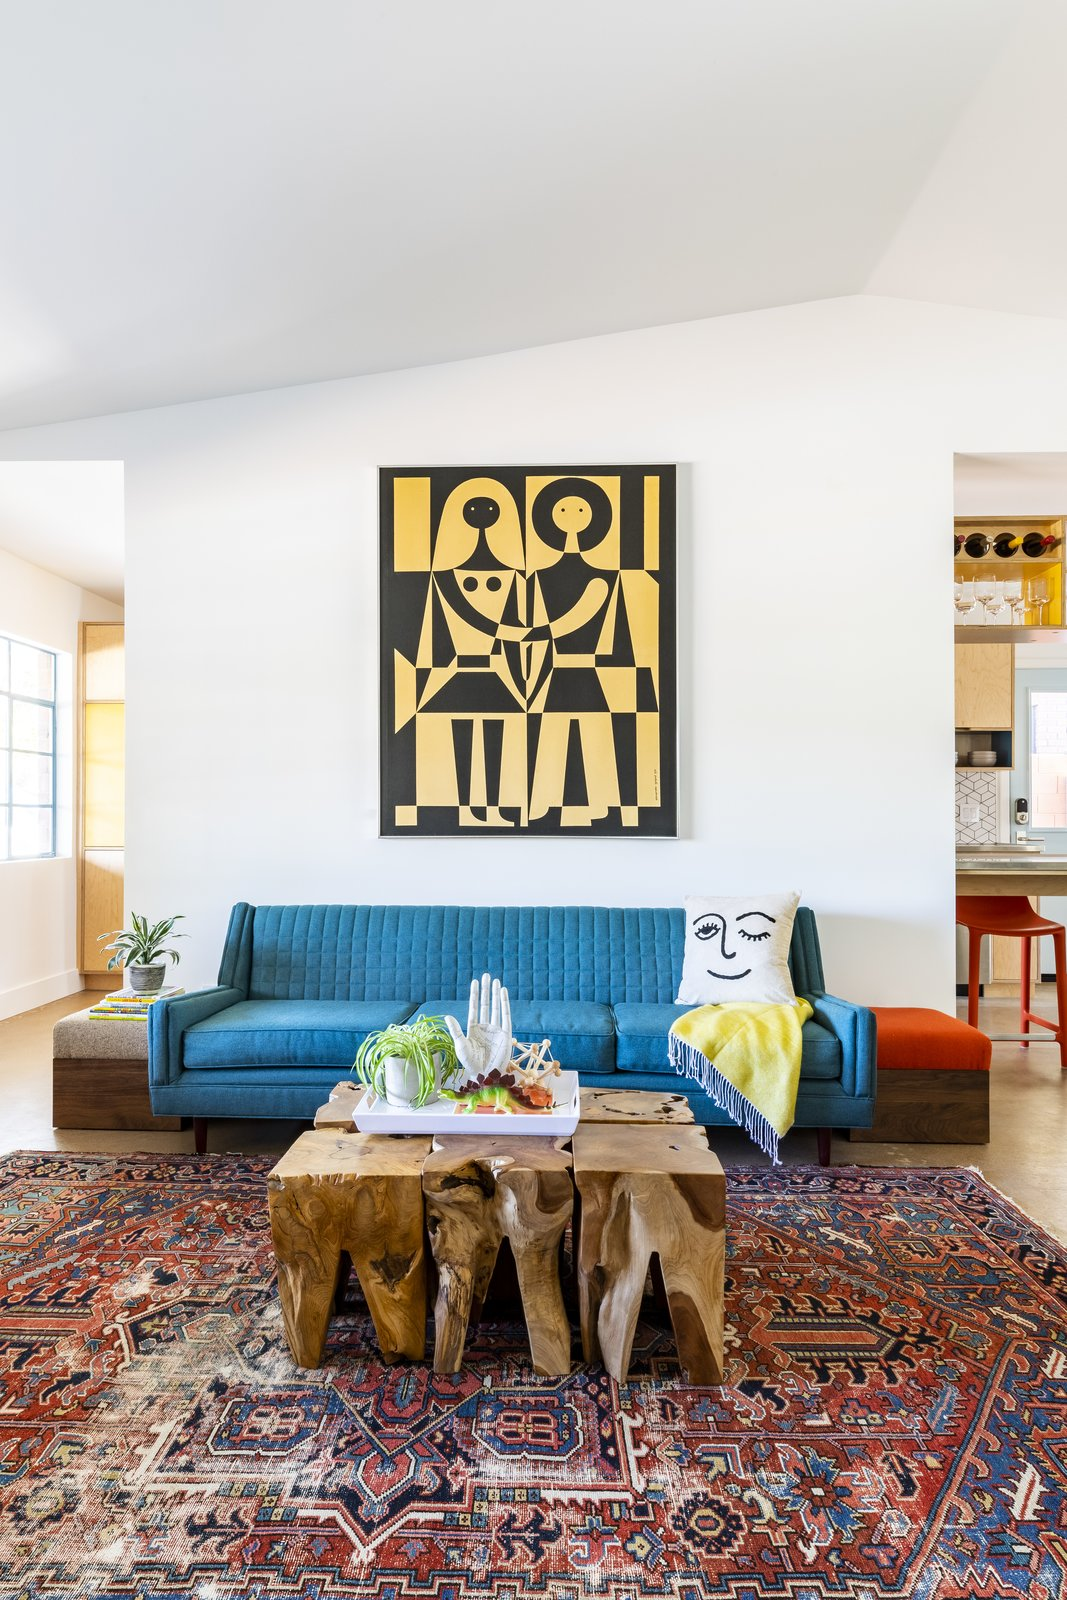 15 Ultimate Craigslist Scores That Ll, Craigslist Dining Room Set